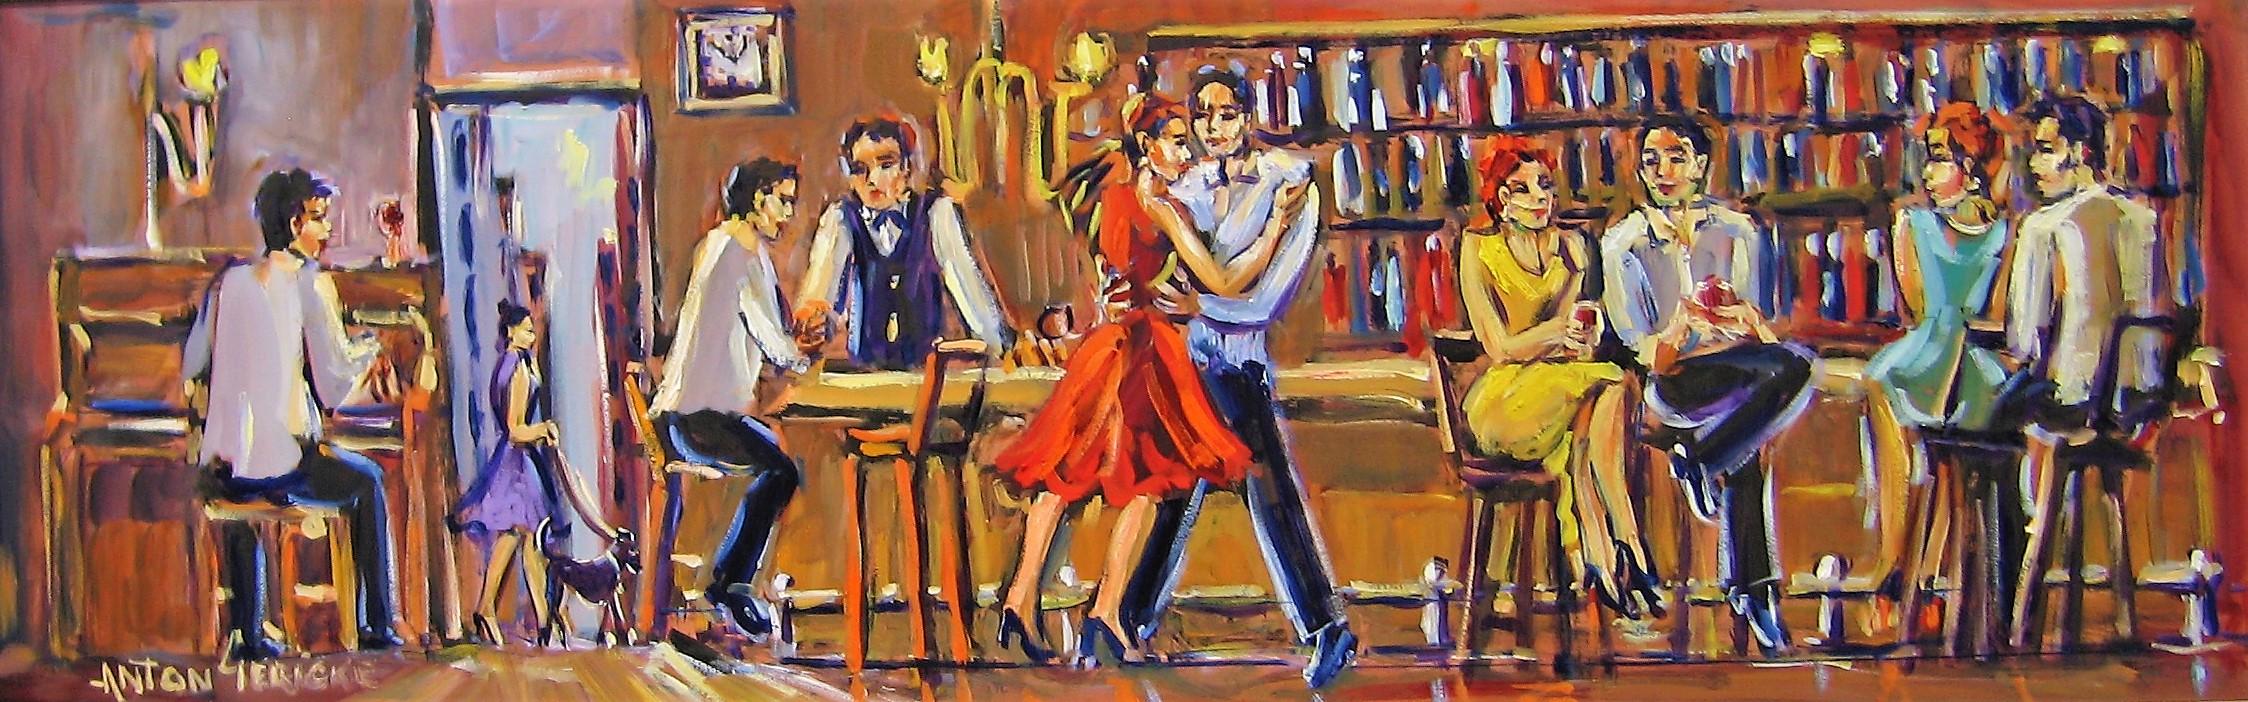 Anton Gericke Artist, south African art, Fine art, oil painting, oil paint, oil artist, investment, best buy, value, famous artist, ou meester, belegging, bele, fyn kuns, anton gericke artist, anton gericke south african artist, anton, gericke, anton gericke, anton gericke oil, streetscene, italian, french , cafe , elegant , vibrant, decorative, decor, modern painting, kknk , small wall space, dining room, diy decor, buy art, auction